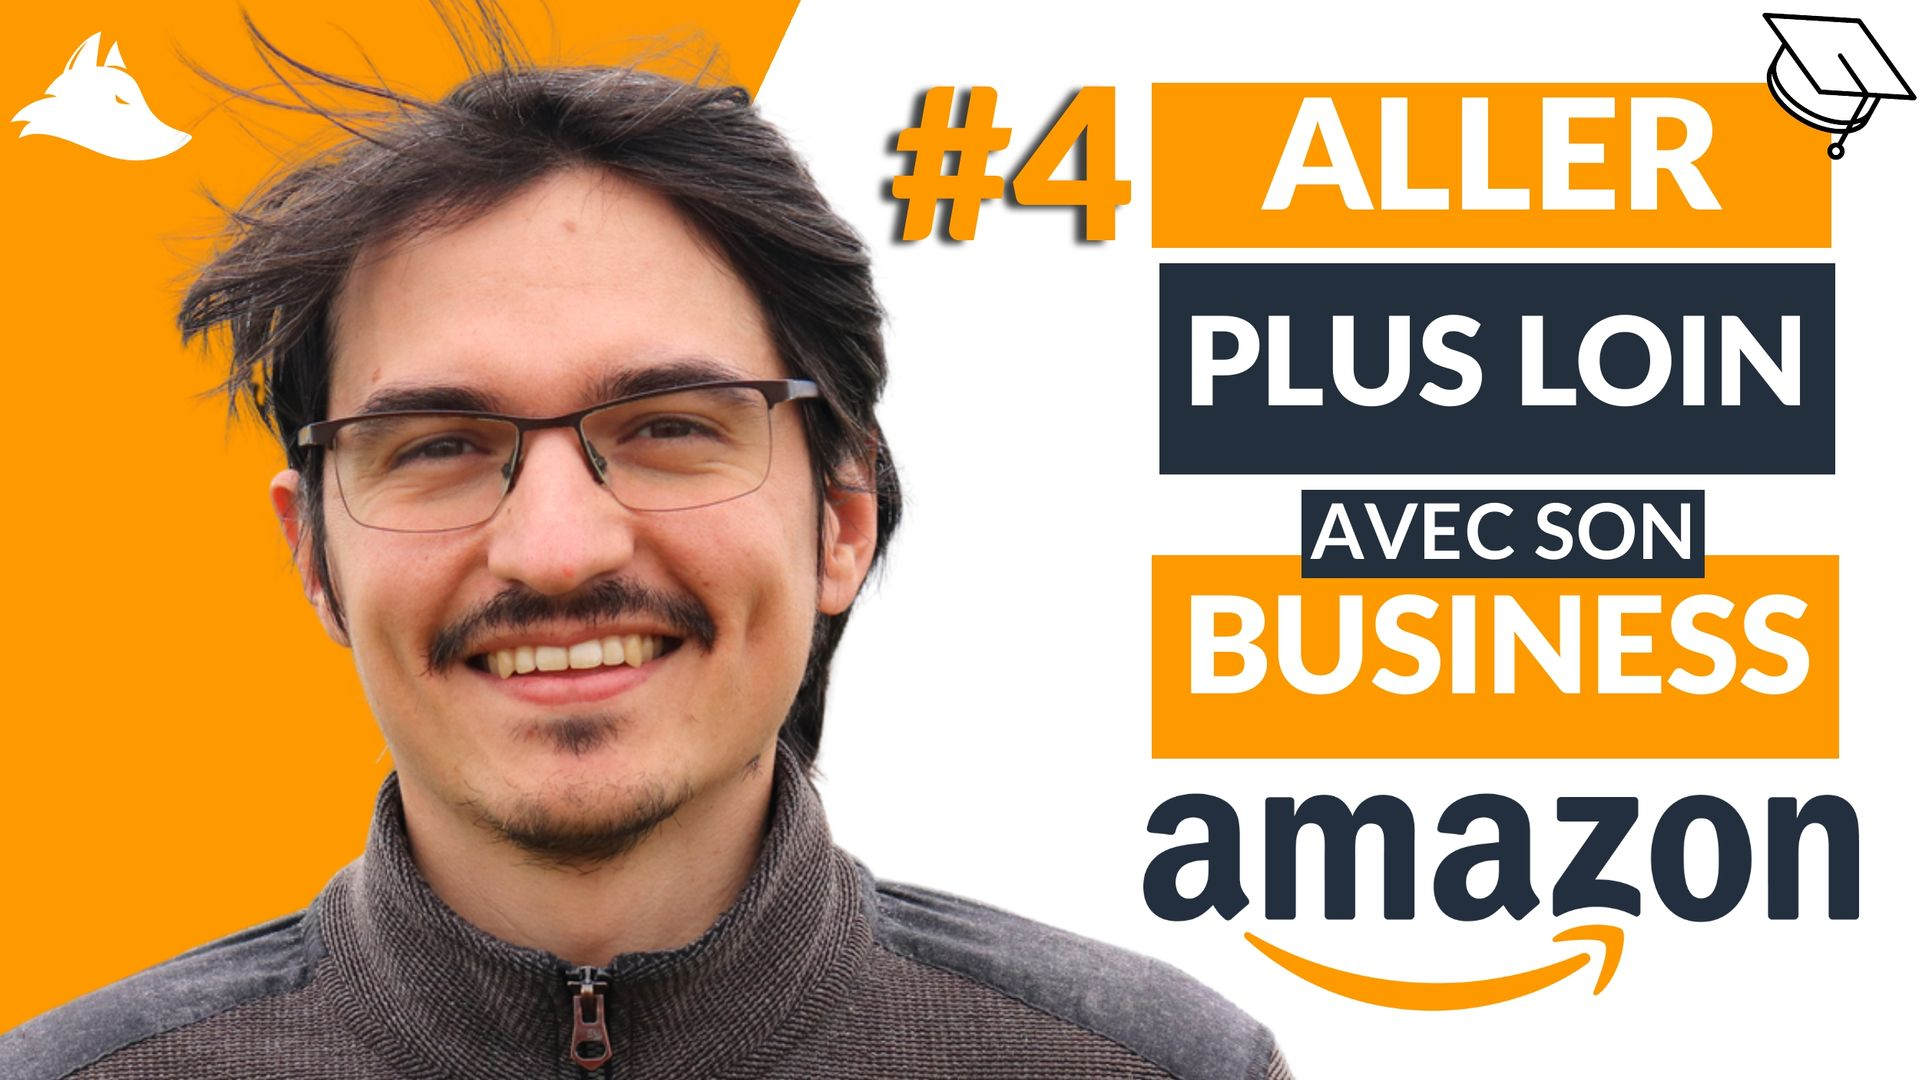 Comment ALLER PLUS LOIN avec son business Amazon FBA ? – Mini-formation Intellifox – 4/4